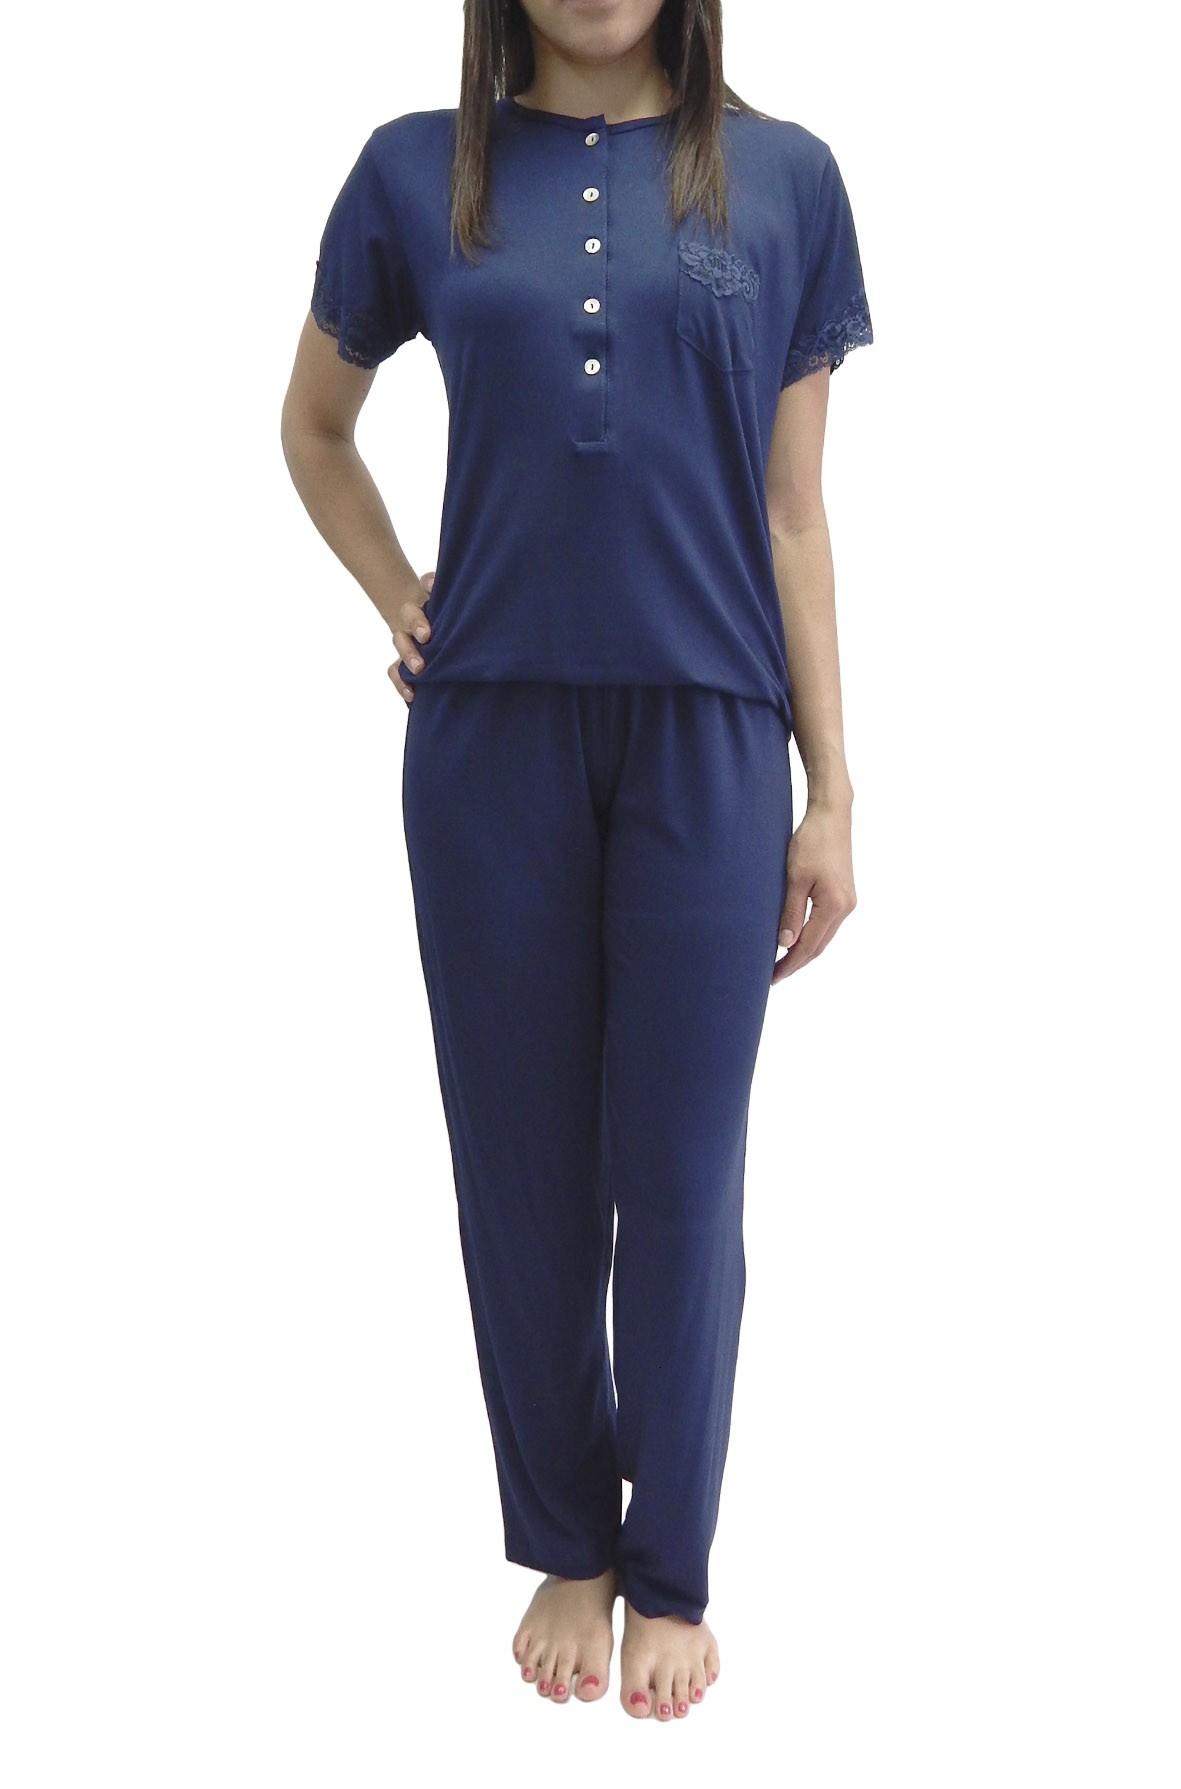 Pijama Feminino Manga Curta Calça Comprida Básico Com Renda - Foxx